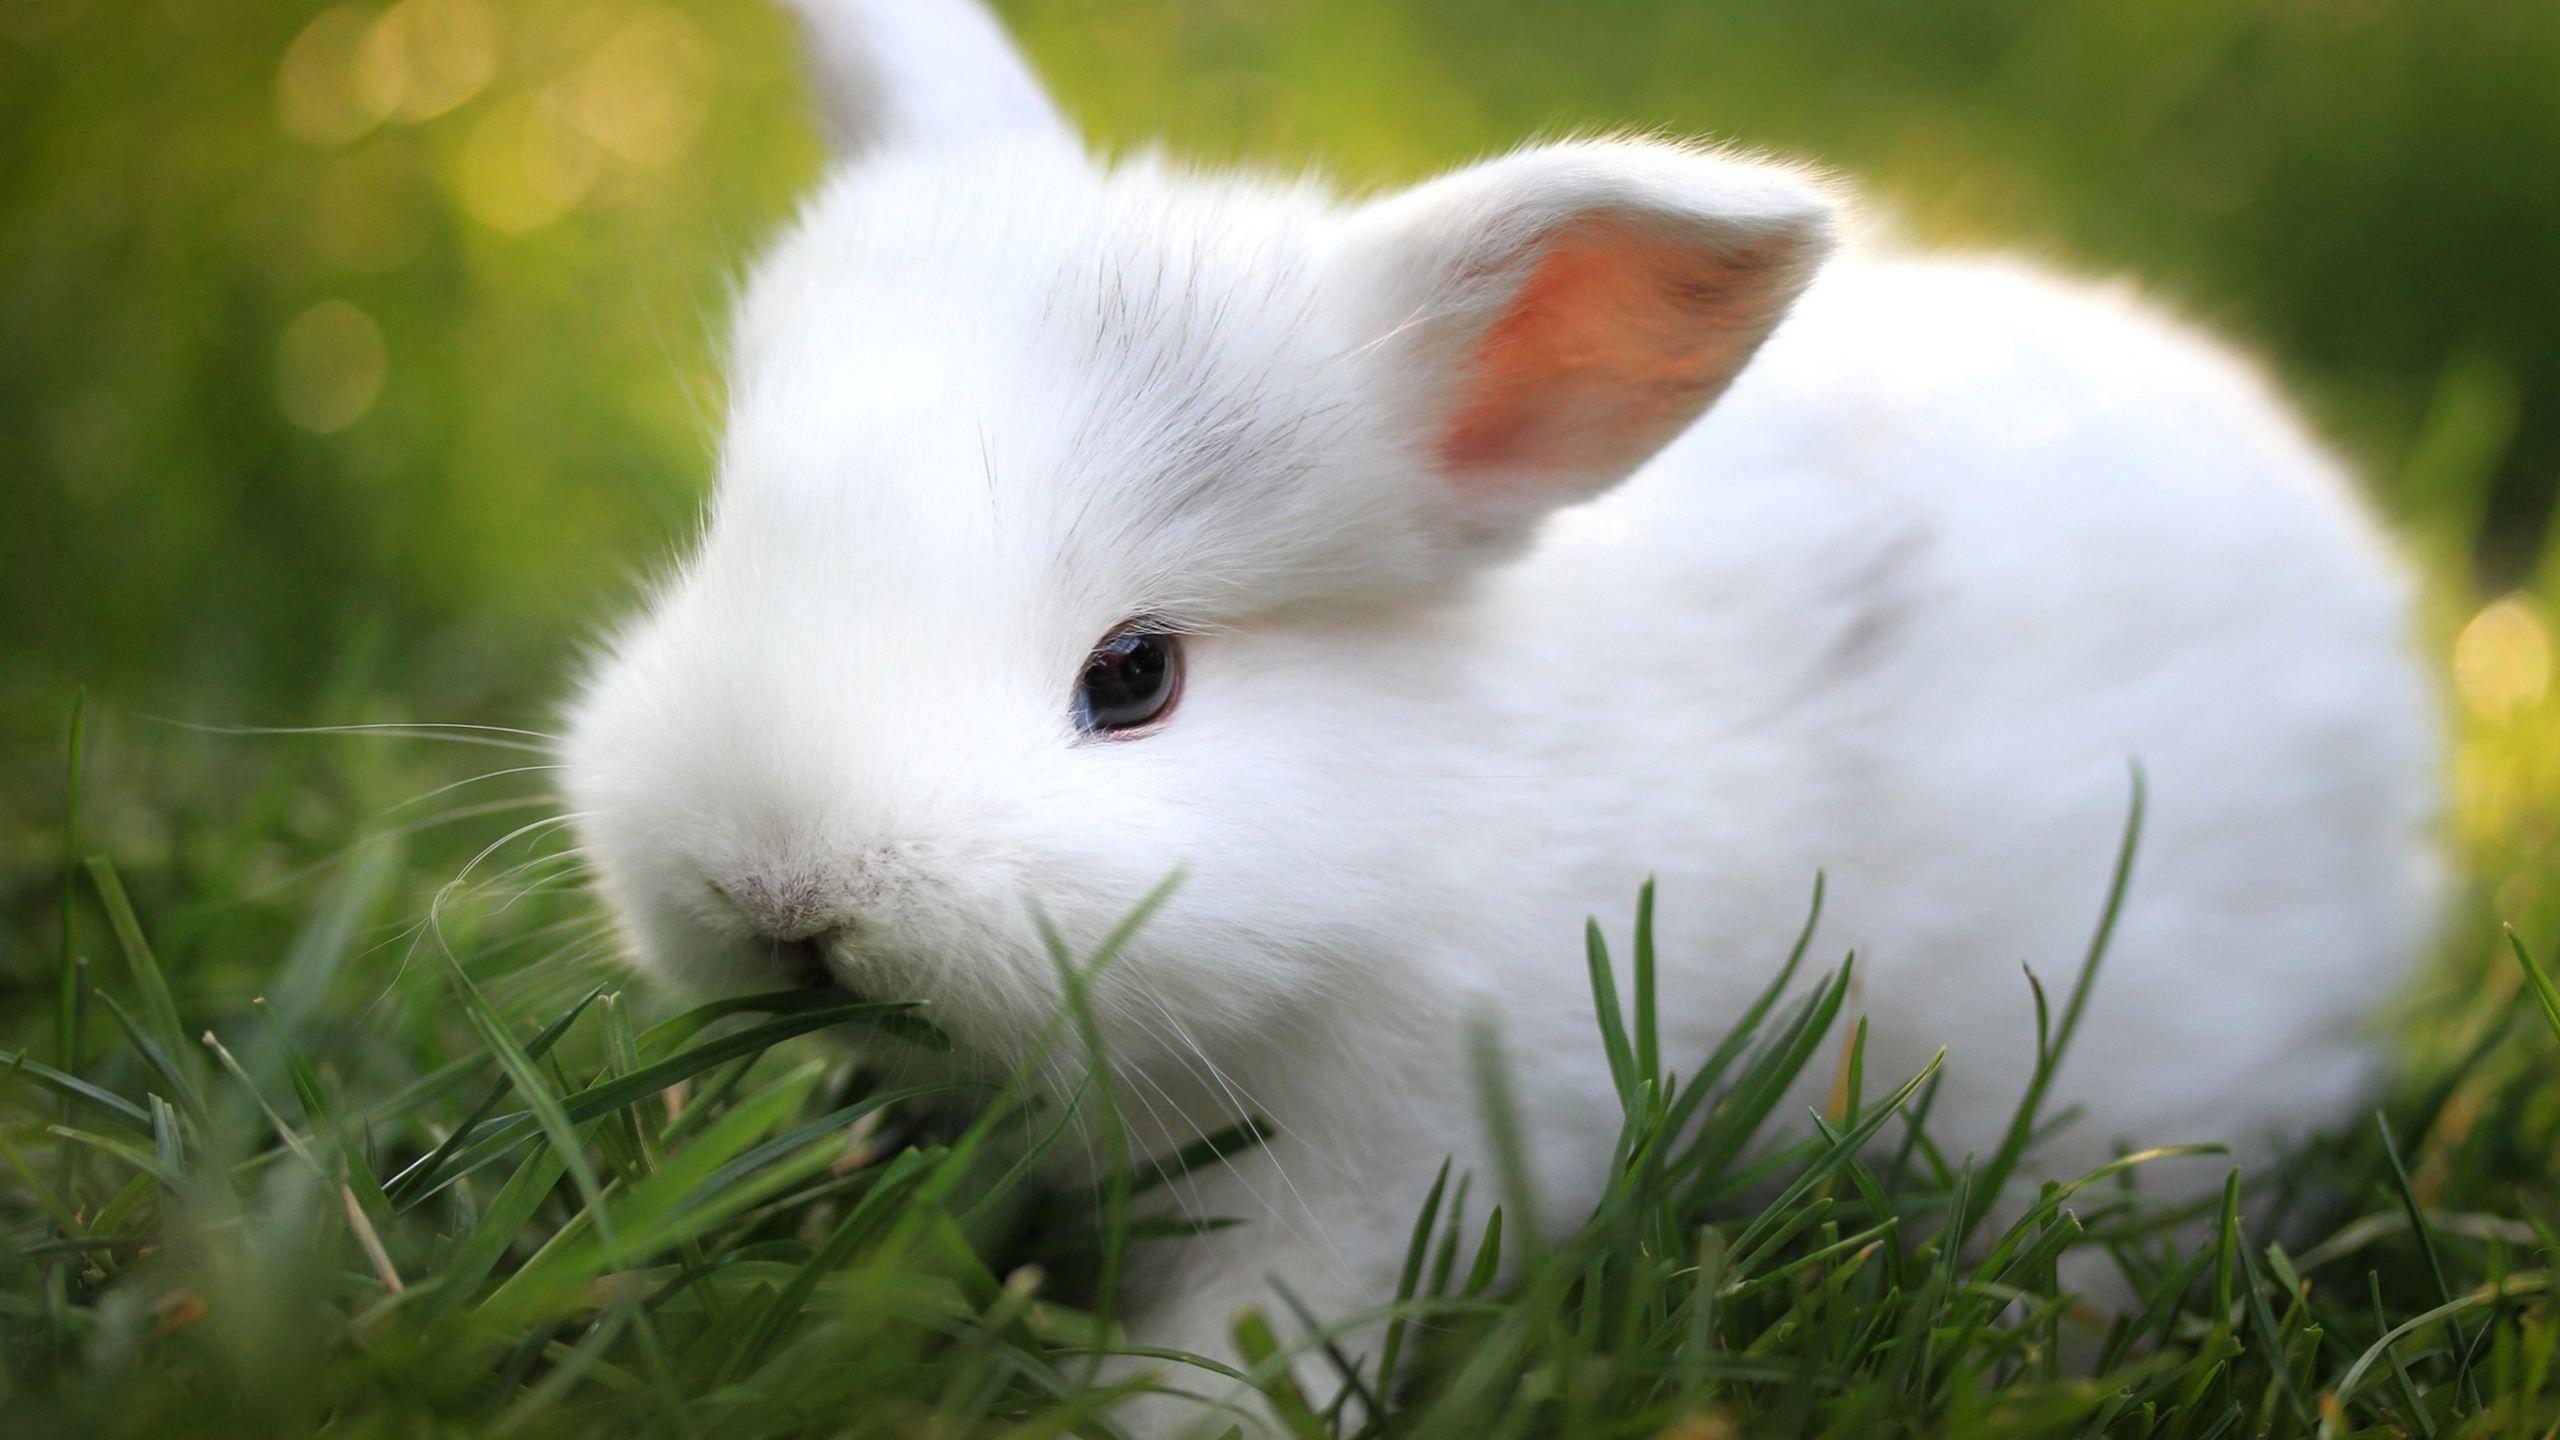 Baby Bunny Wallpaper Rabbit Wallpaper Cute Bunny Pictures Animals